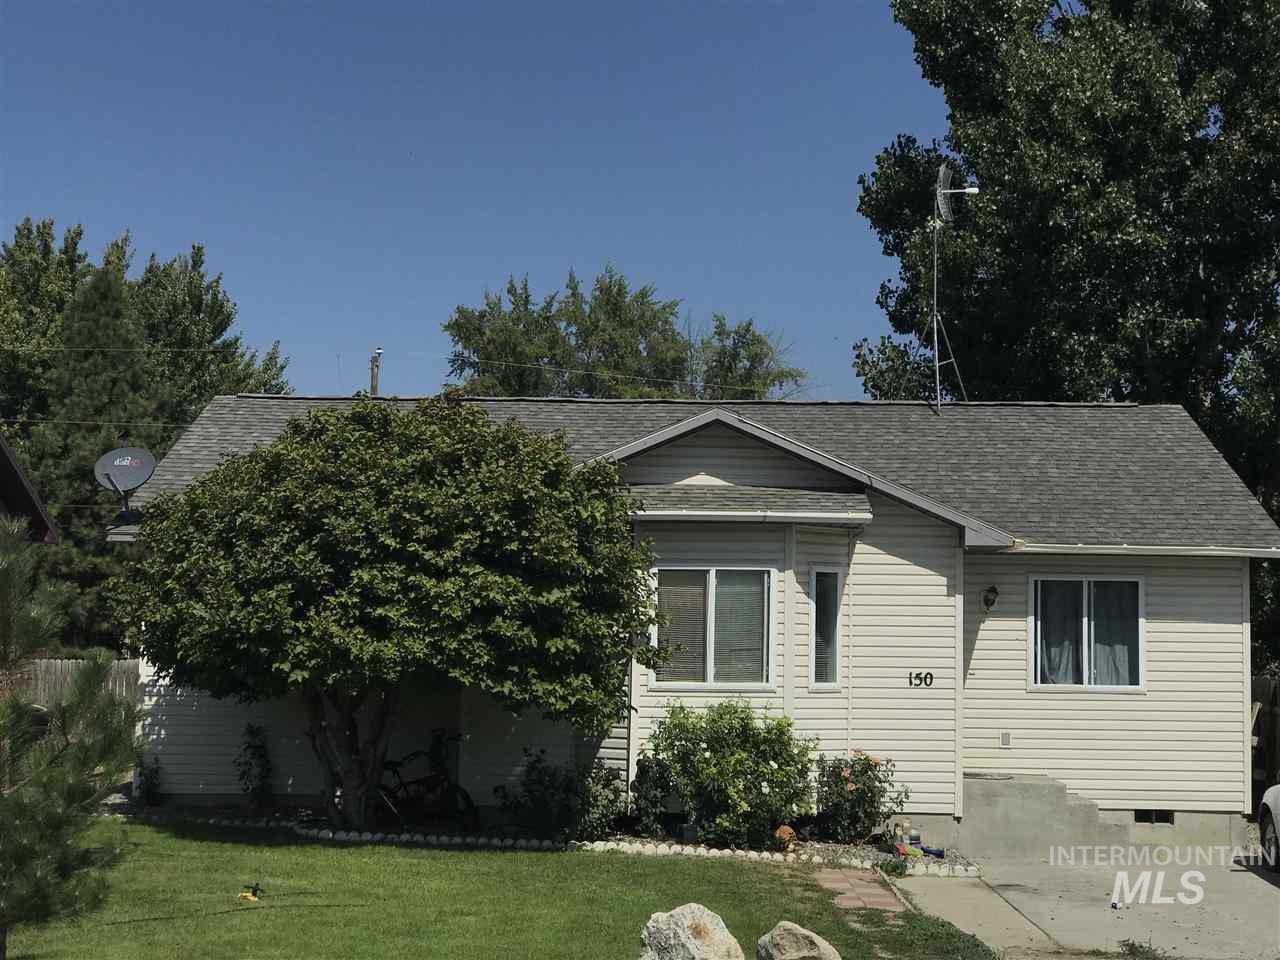 Casa Unifamiliar por un Venta en 150 5th Ave. W 150 5th Ave. W Wendell, Idaho 83355